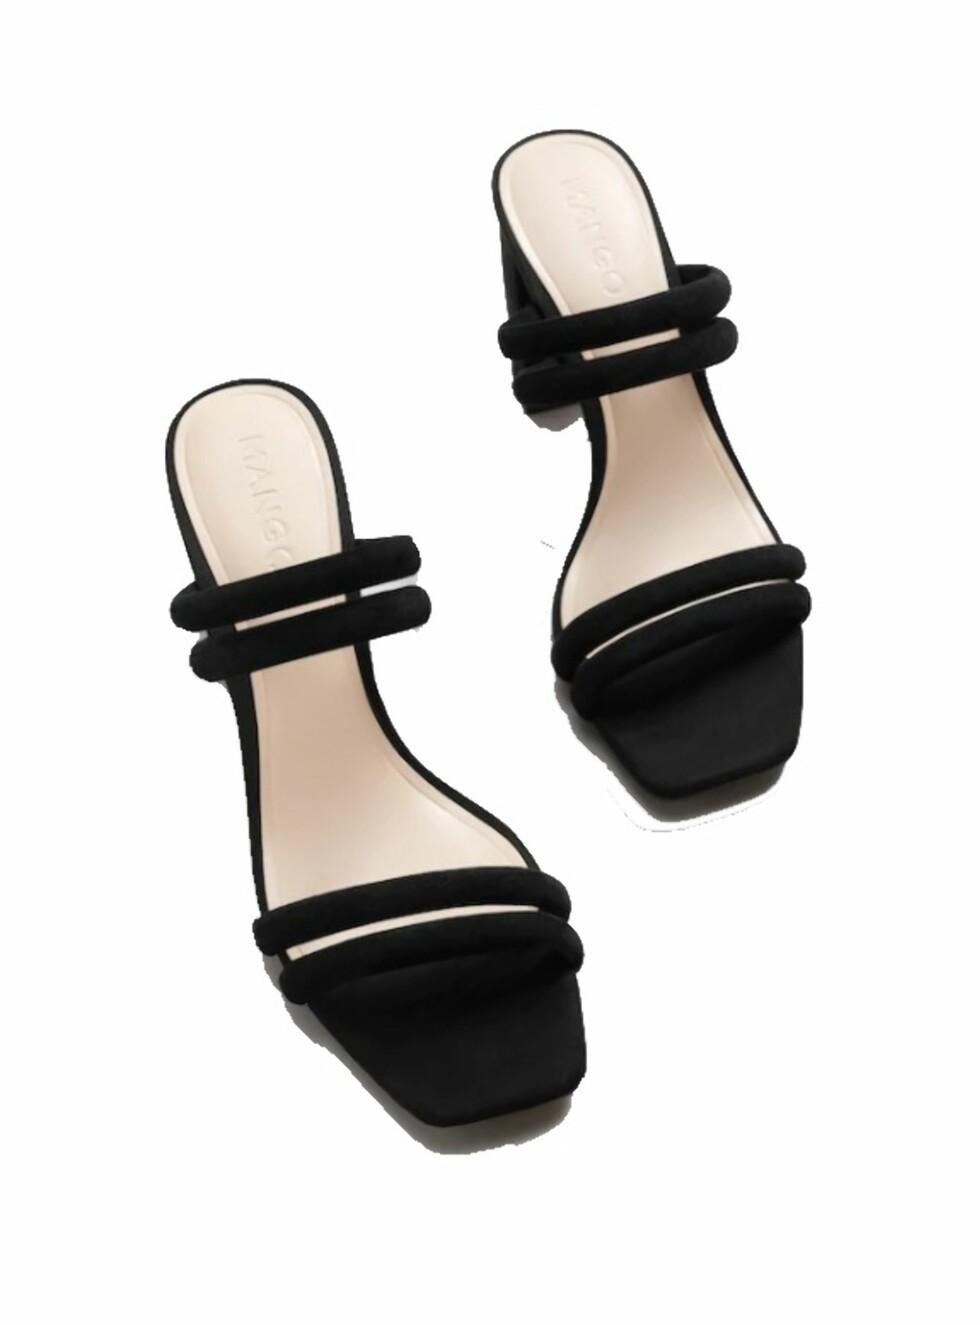 Sko fra Mango |499,-| https://shop.mango.com/no/damer/sko-sandaler-med-h%C3%A6l/sandal-med-skinnremmer_23015701.html?c=99&n=1&s=accesorios.accesorio;42,342,442&ts=1518172306849